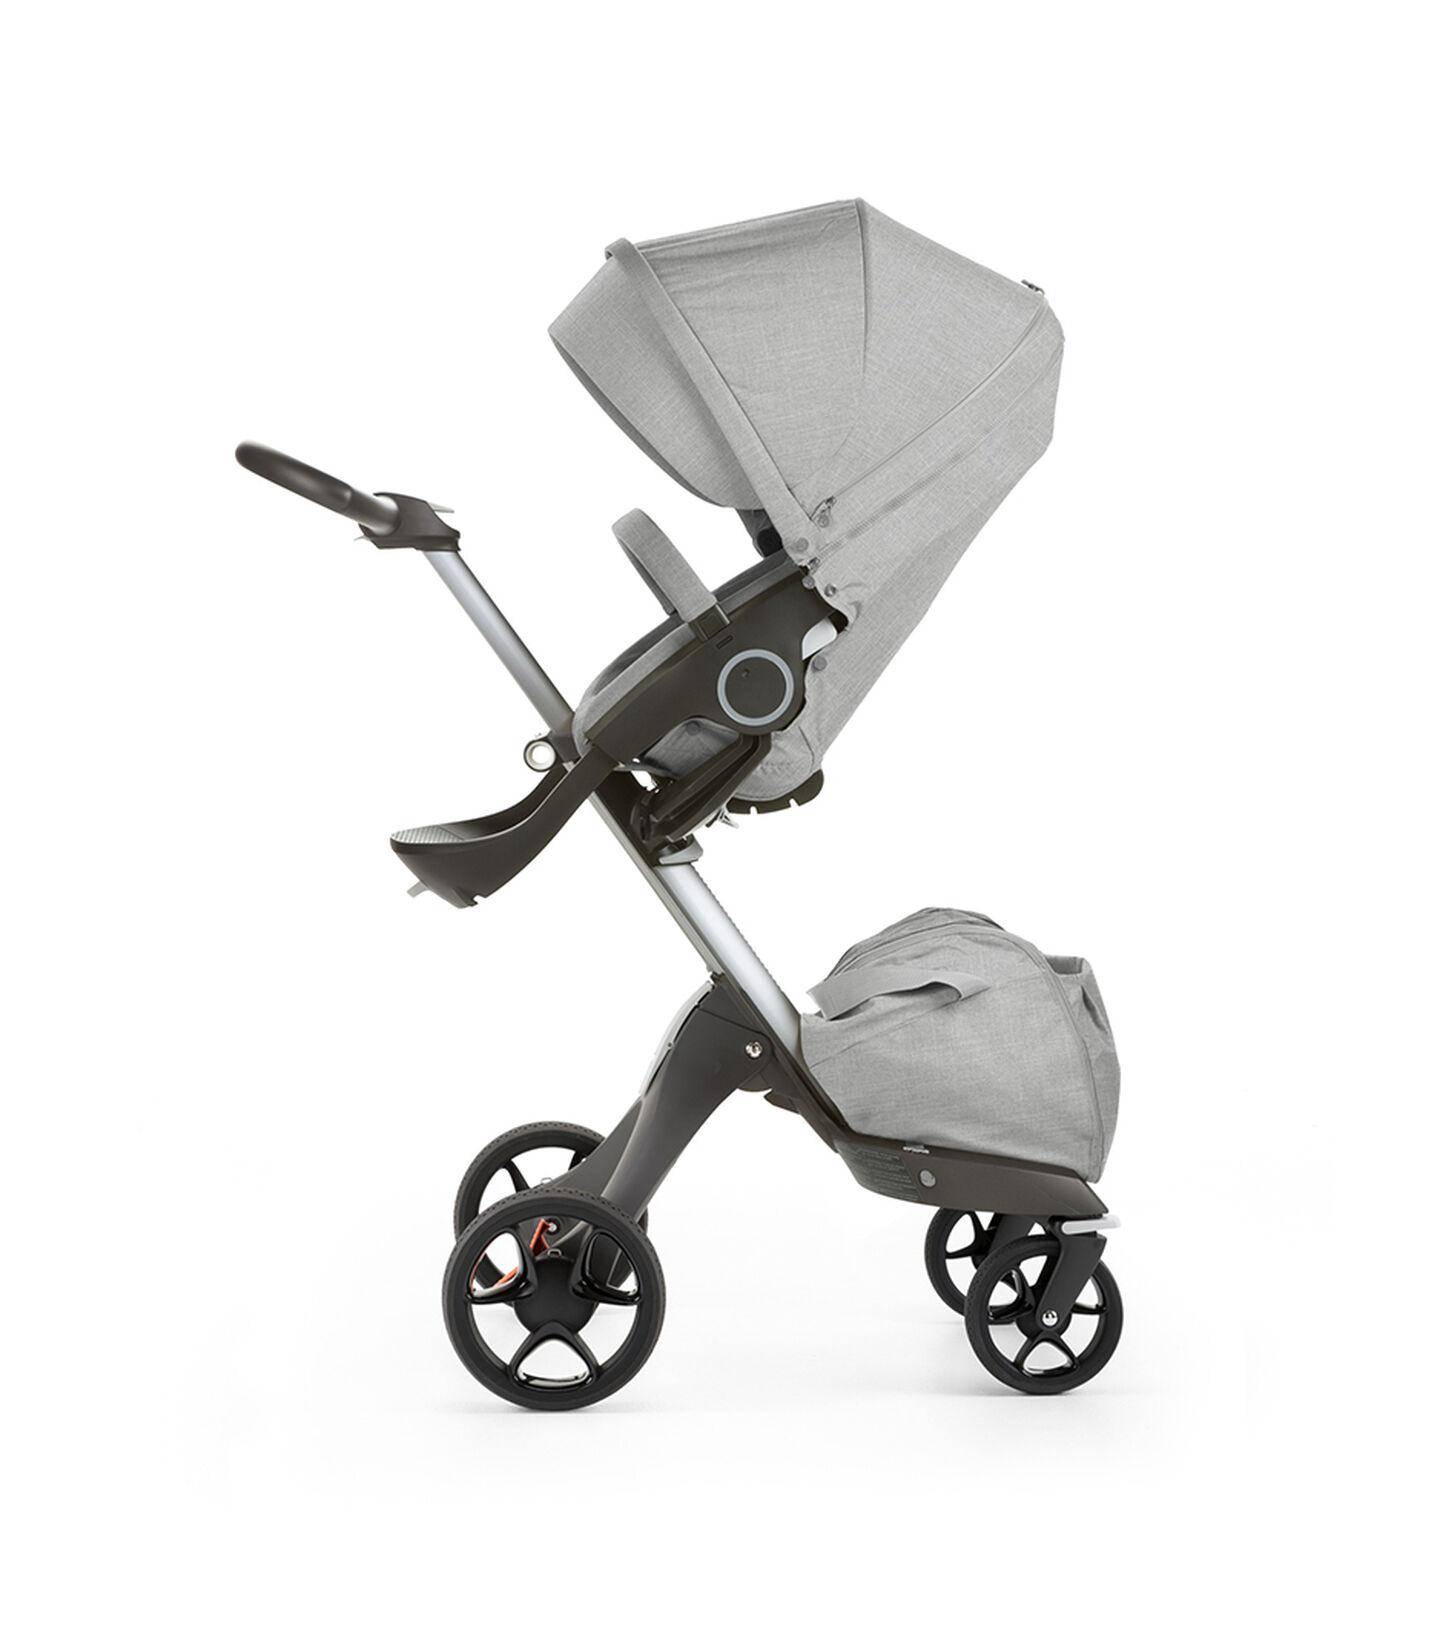 Stokke® Xplory® with Stokke® Stroller Seat, Grey Melange. New wheels 2016.